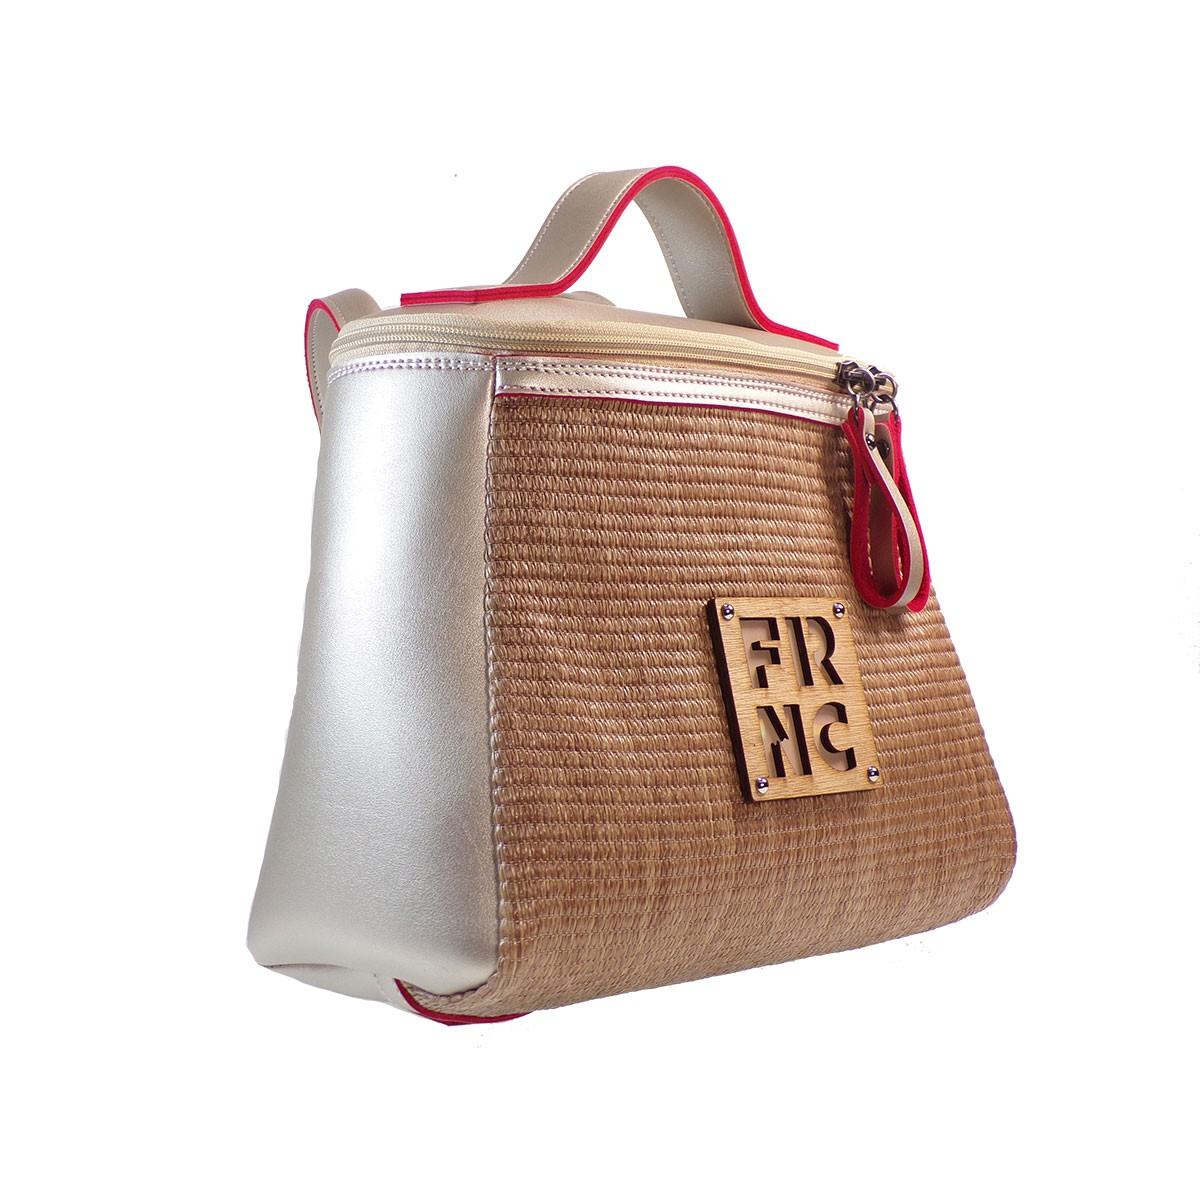 f85d254a4e FRNC FRANCESCO Τσάντα Γυναικεία Πλάτης-Backpack-Ώμου 1290 Πλατίνα ...